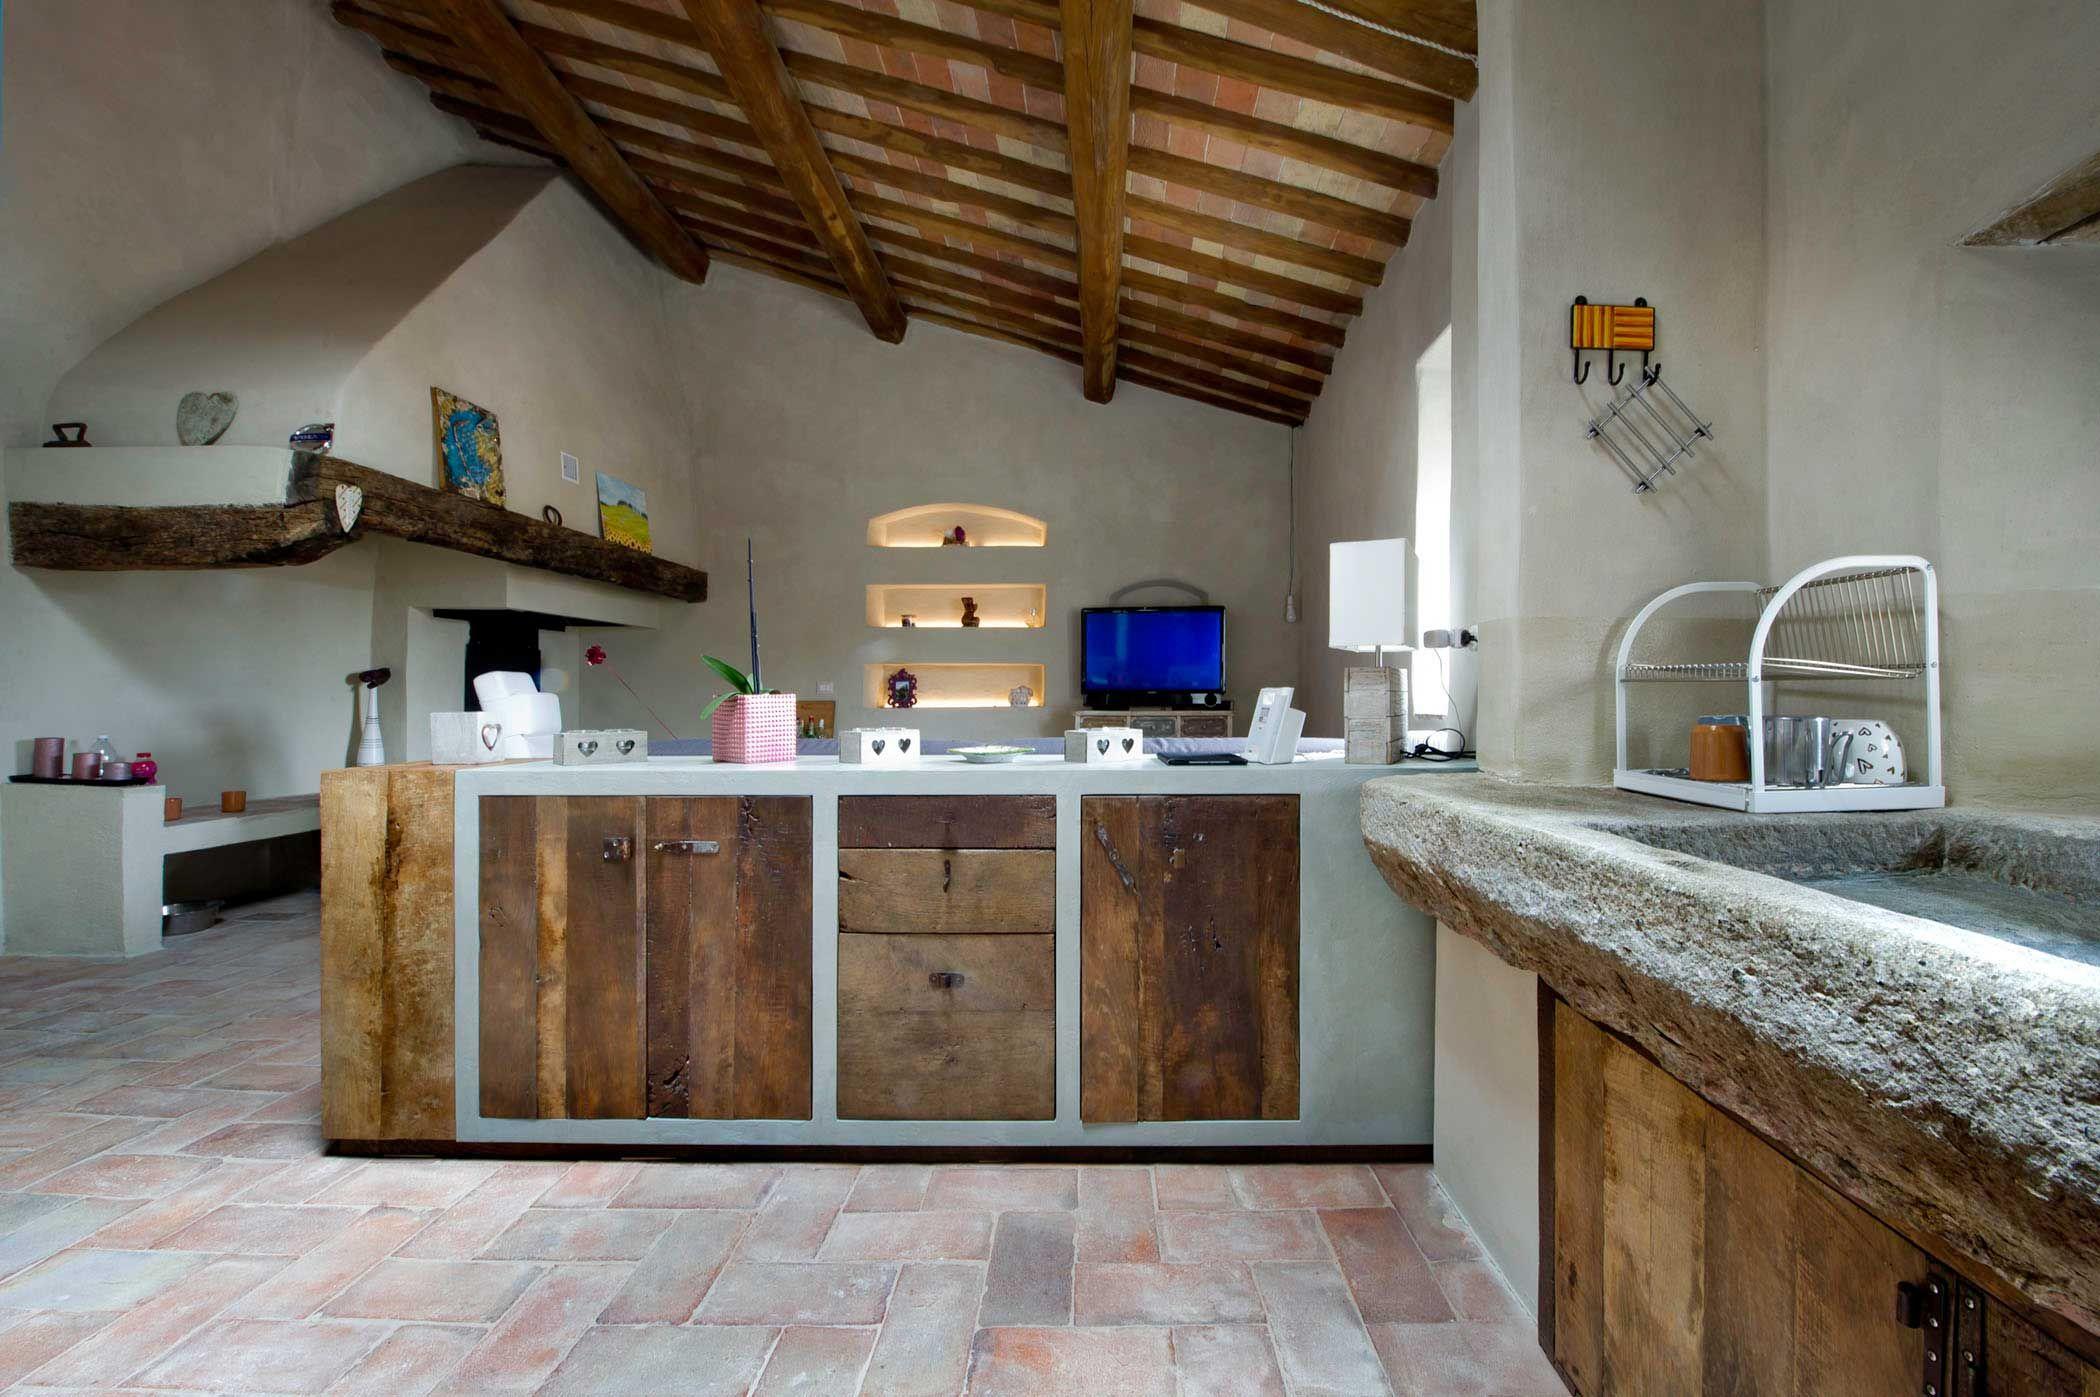 Cucina in muratura con ante in castagno vintage antico bruciato ...